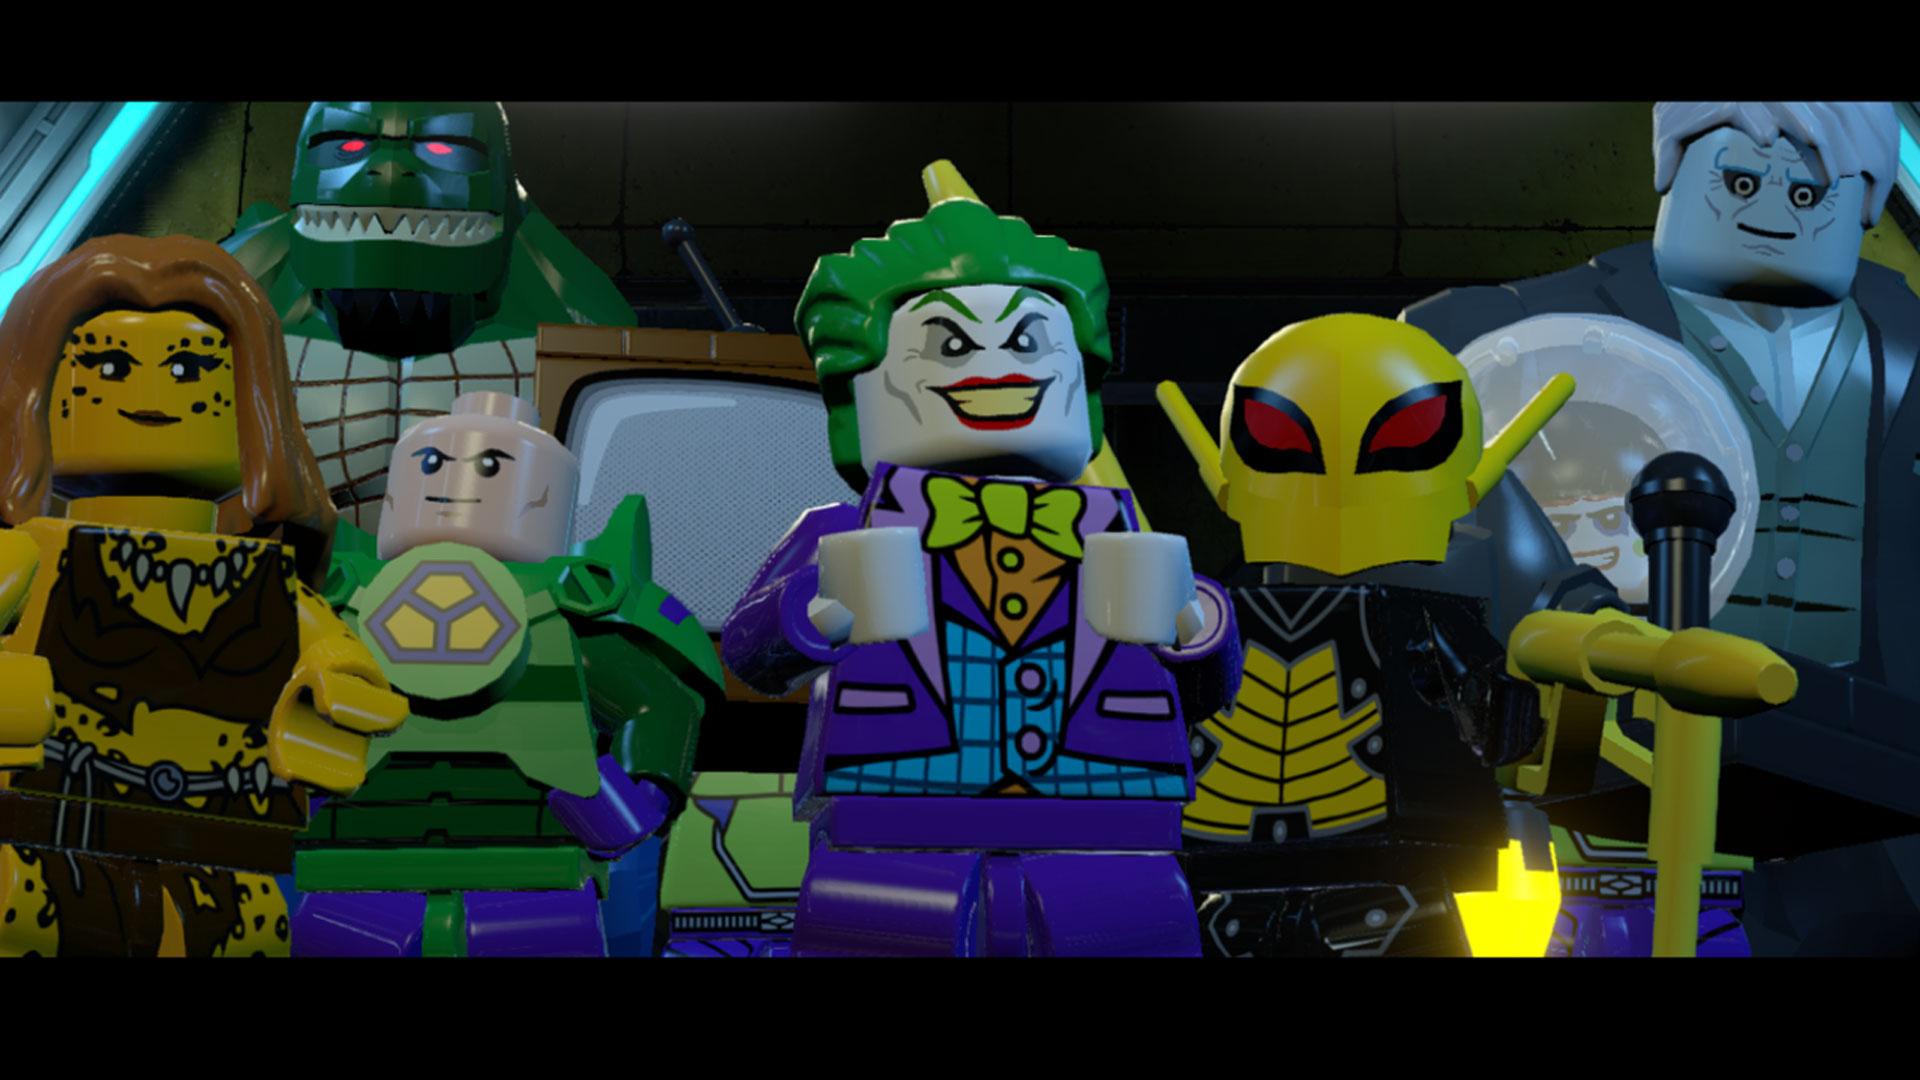 lego batman 3 how to change characters